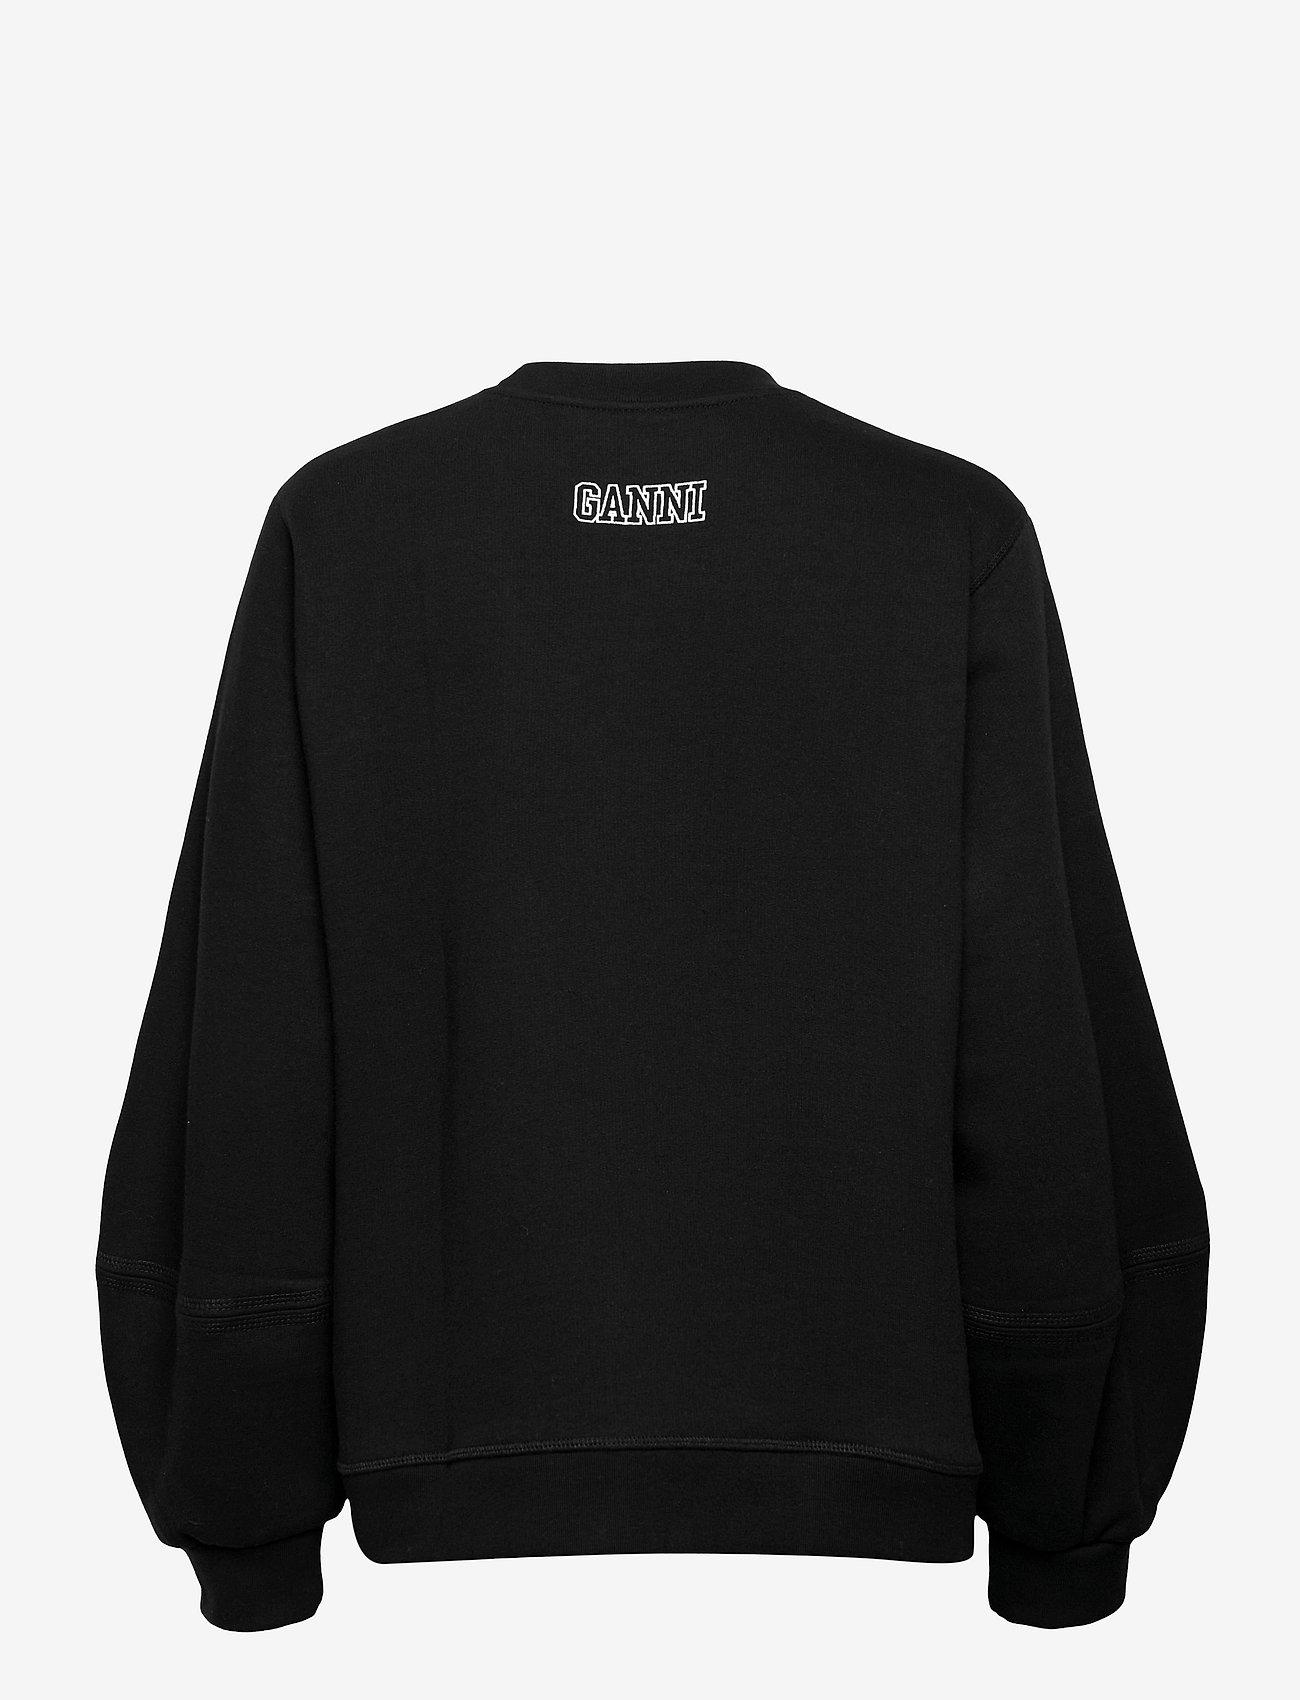 Ganni - Software Isoli - sweatshirts & hoodies - black - 1